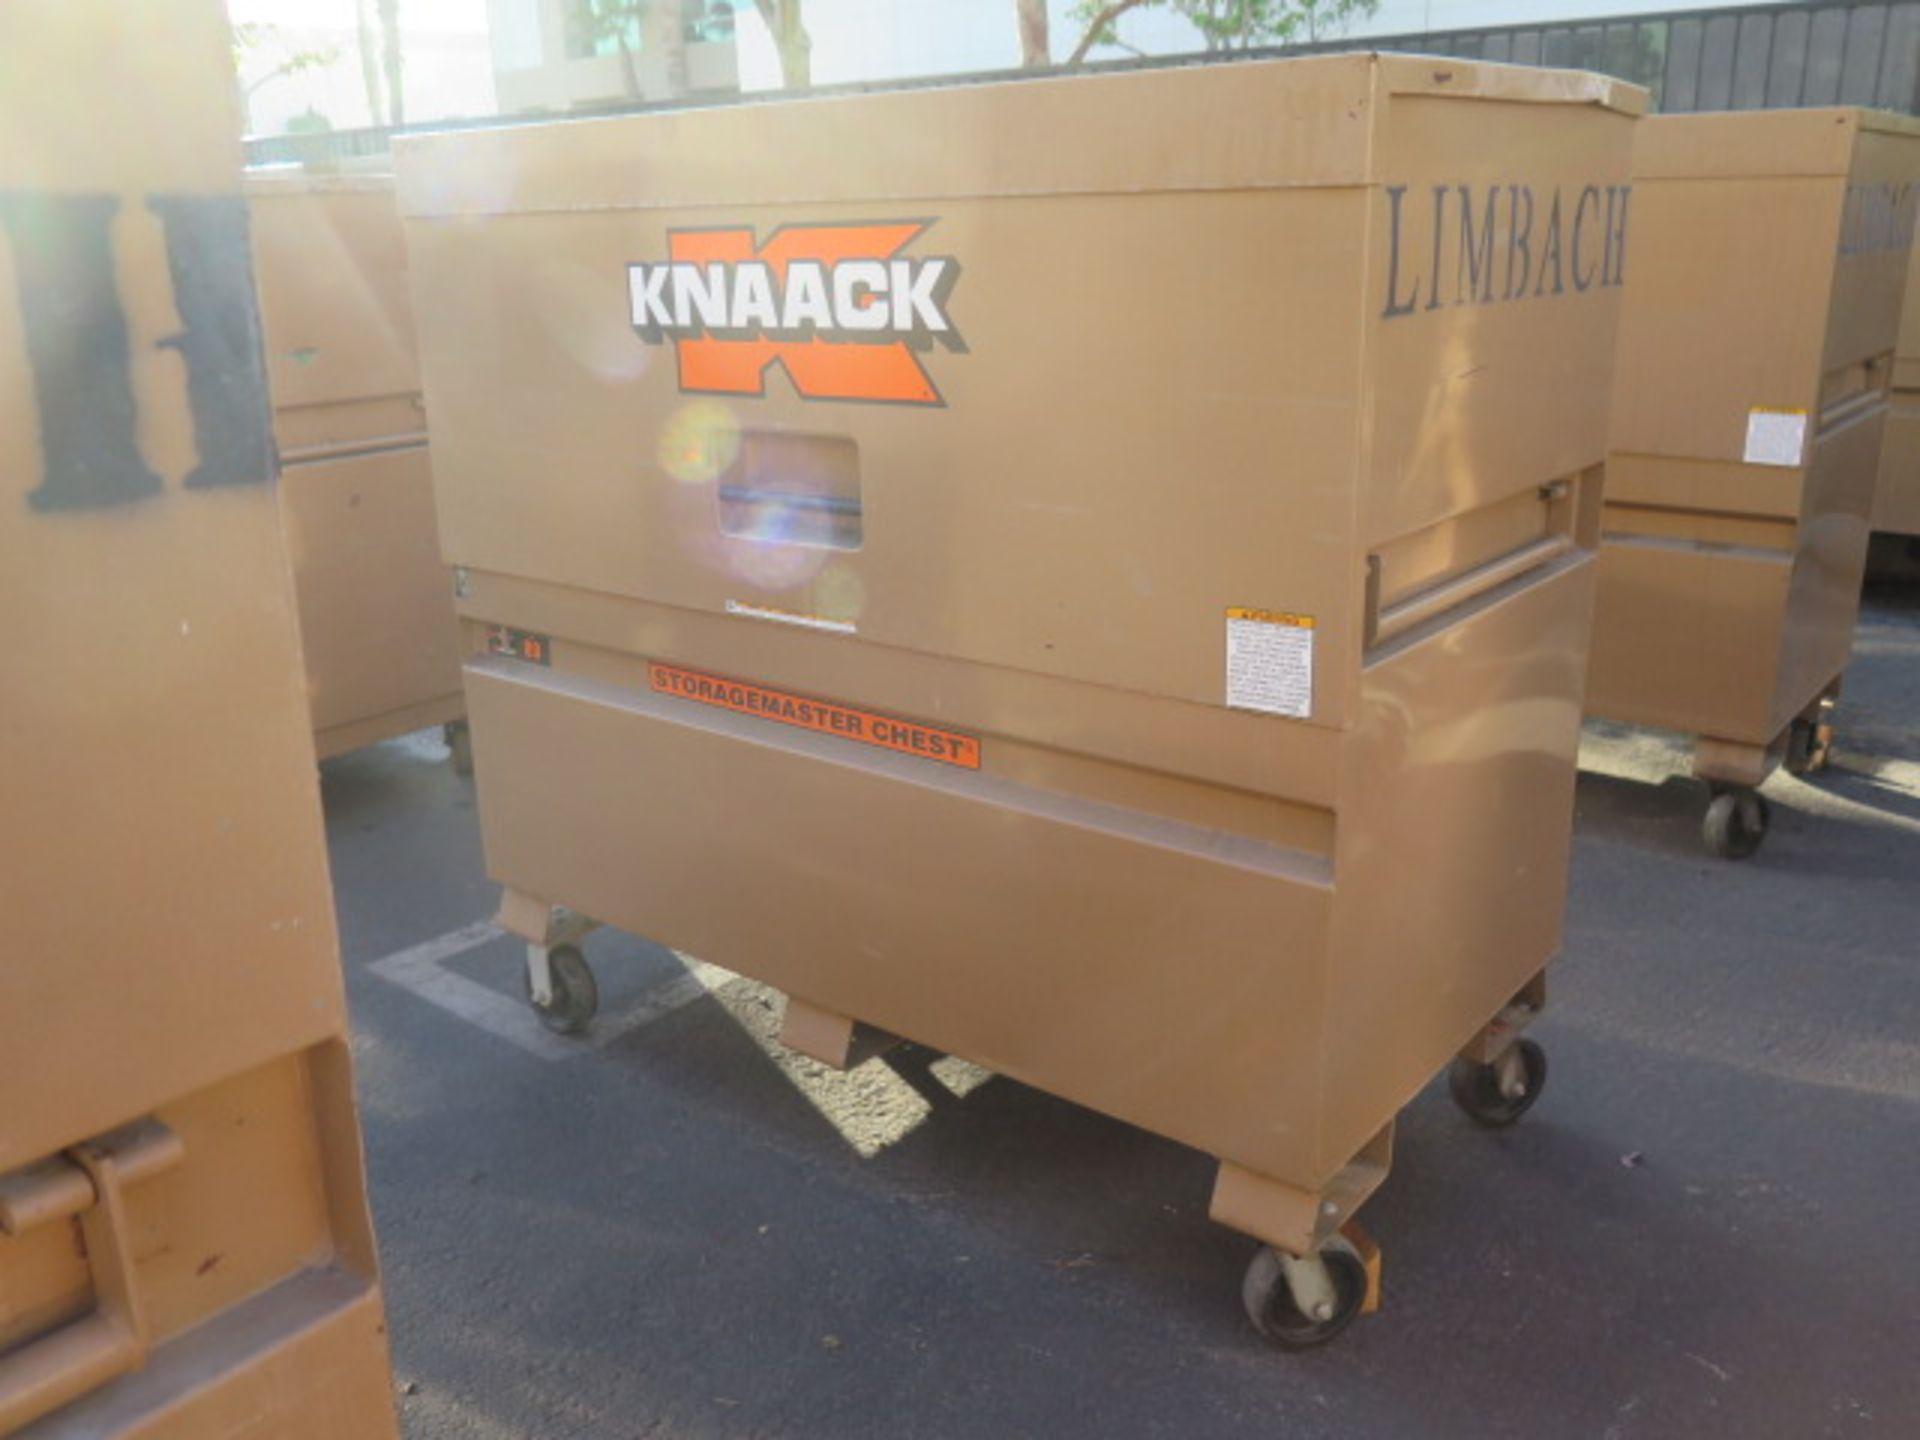 Knaack mdl. 89 Storagemaster Rolling Job Box (SOLD AS-IS - NO WARRANTY) - Image 2 of 9